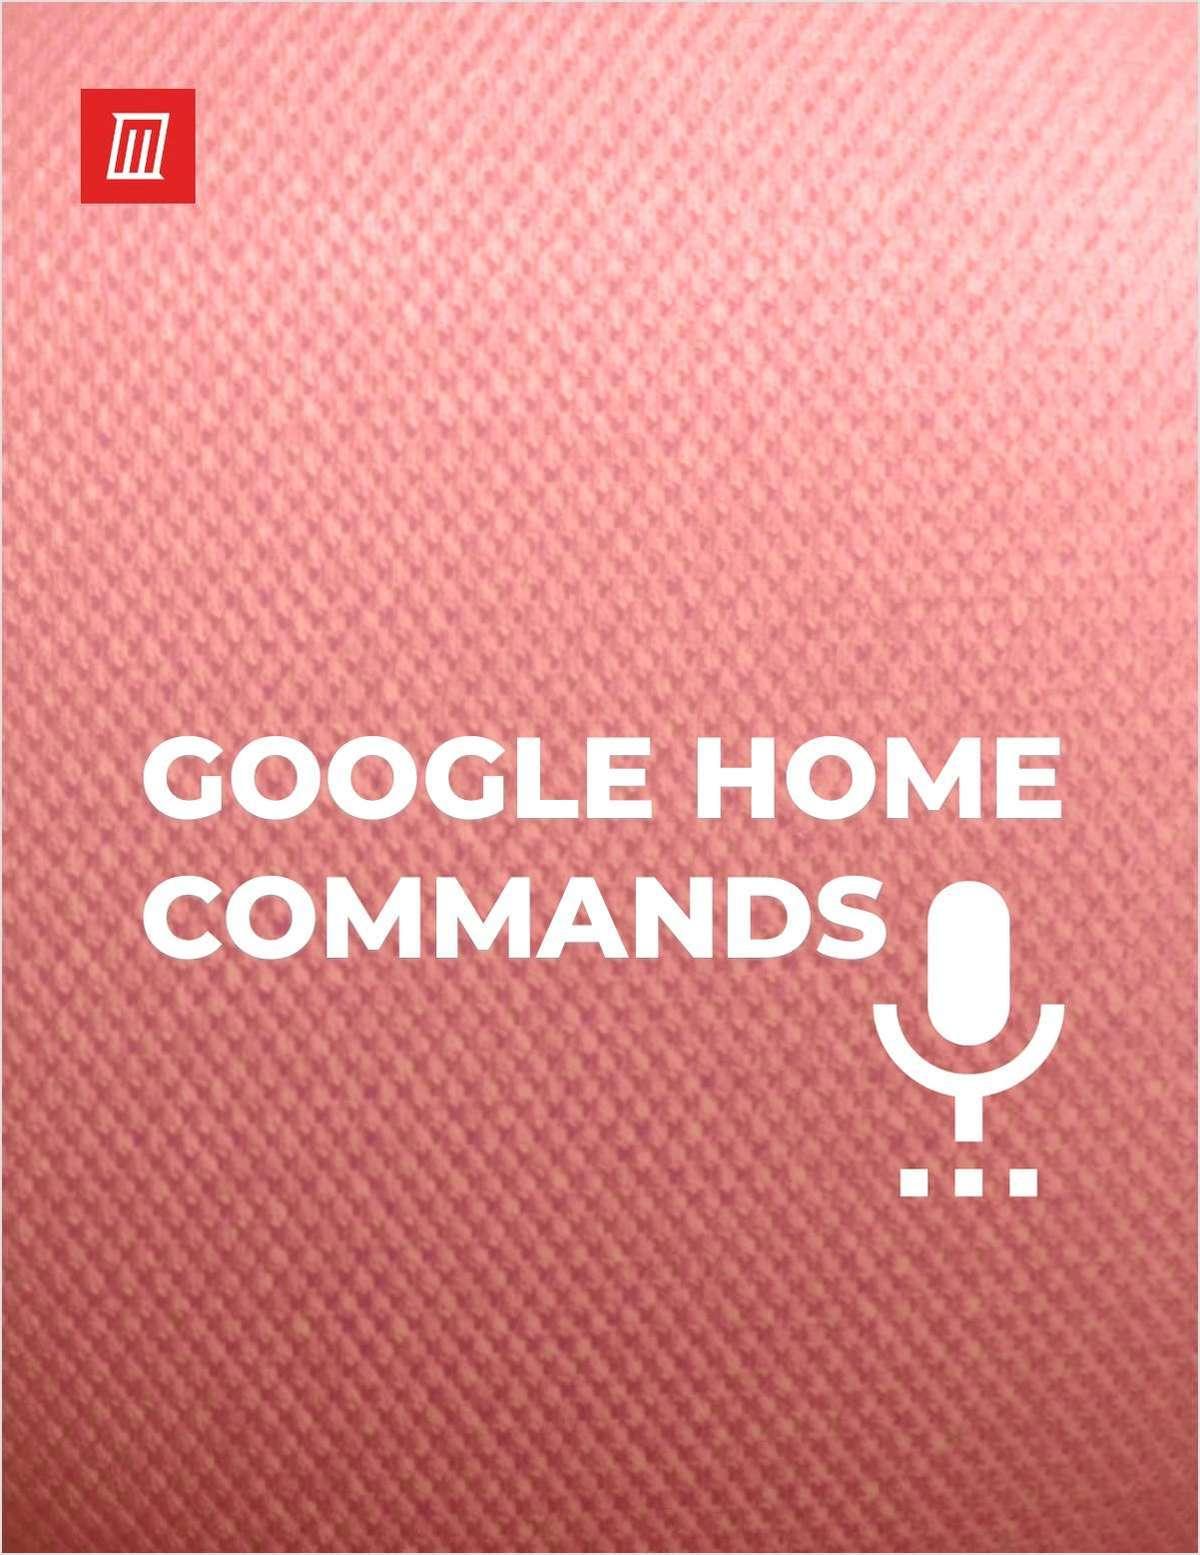 Top Google Home Commands